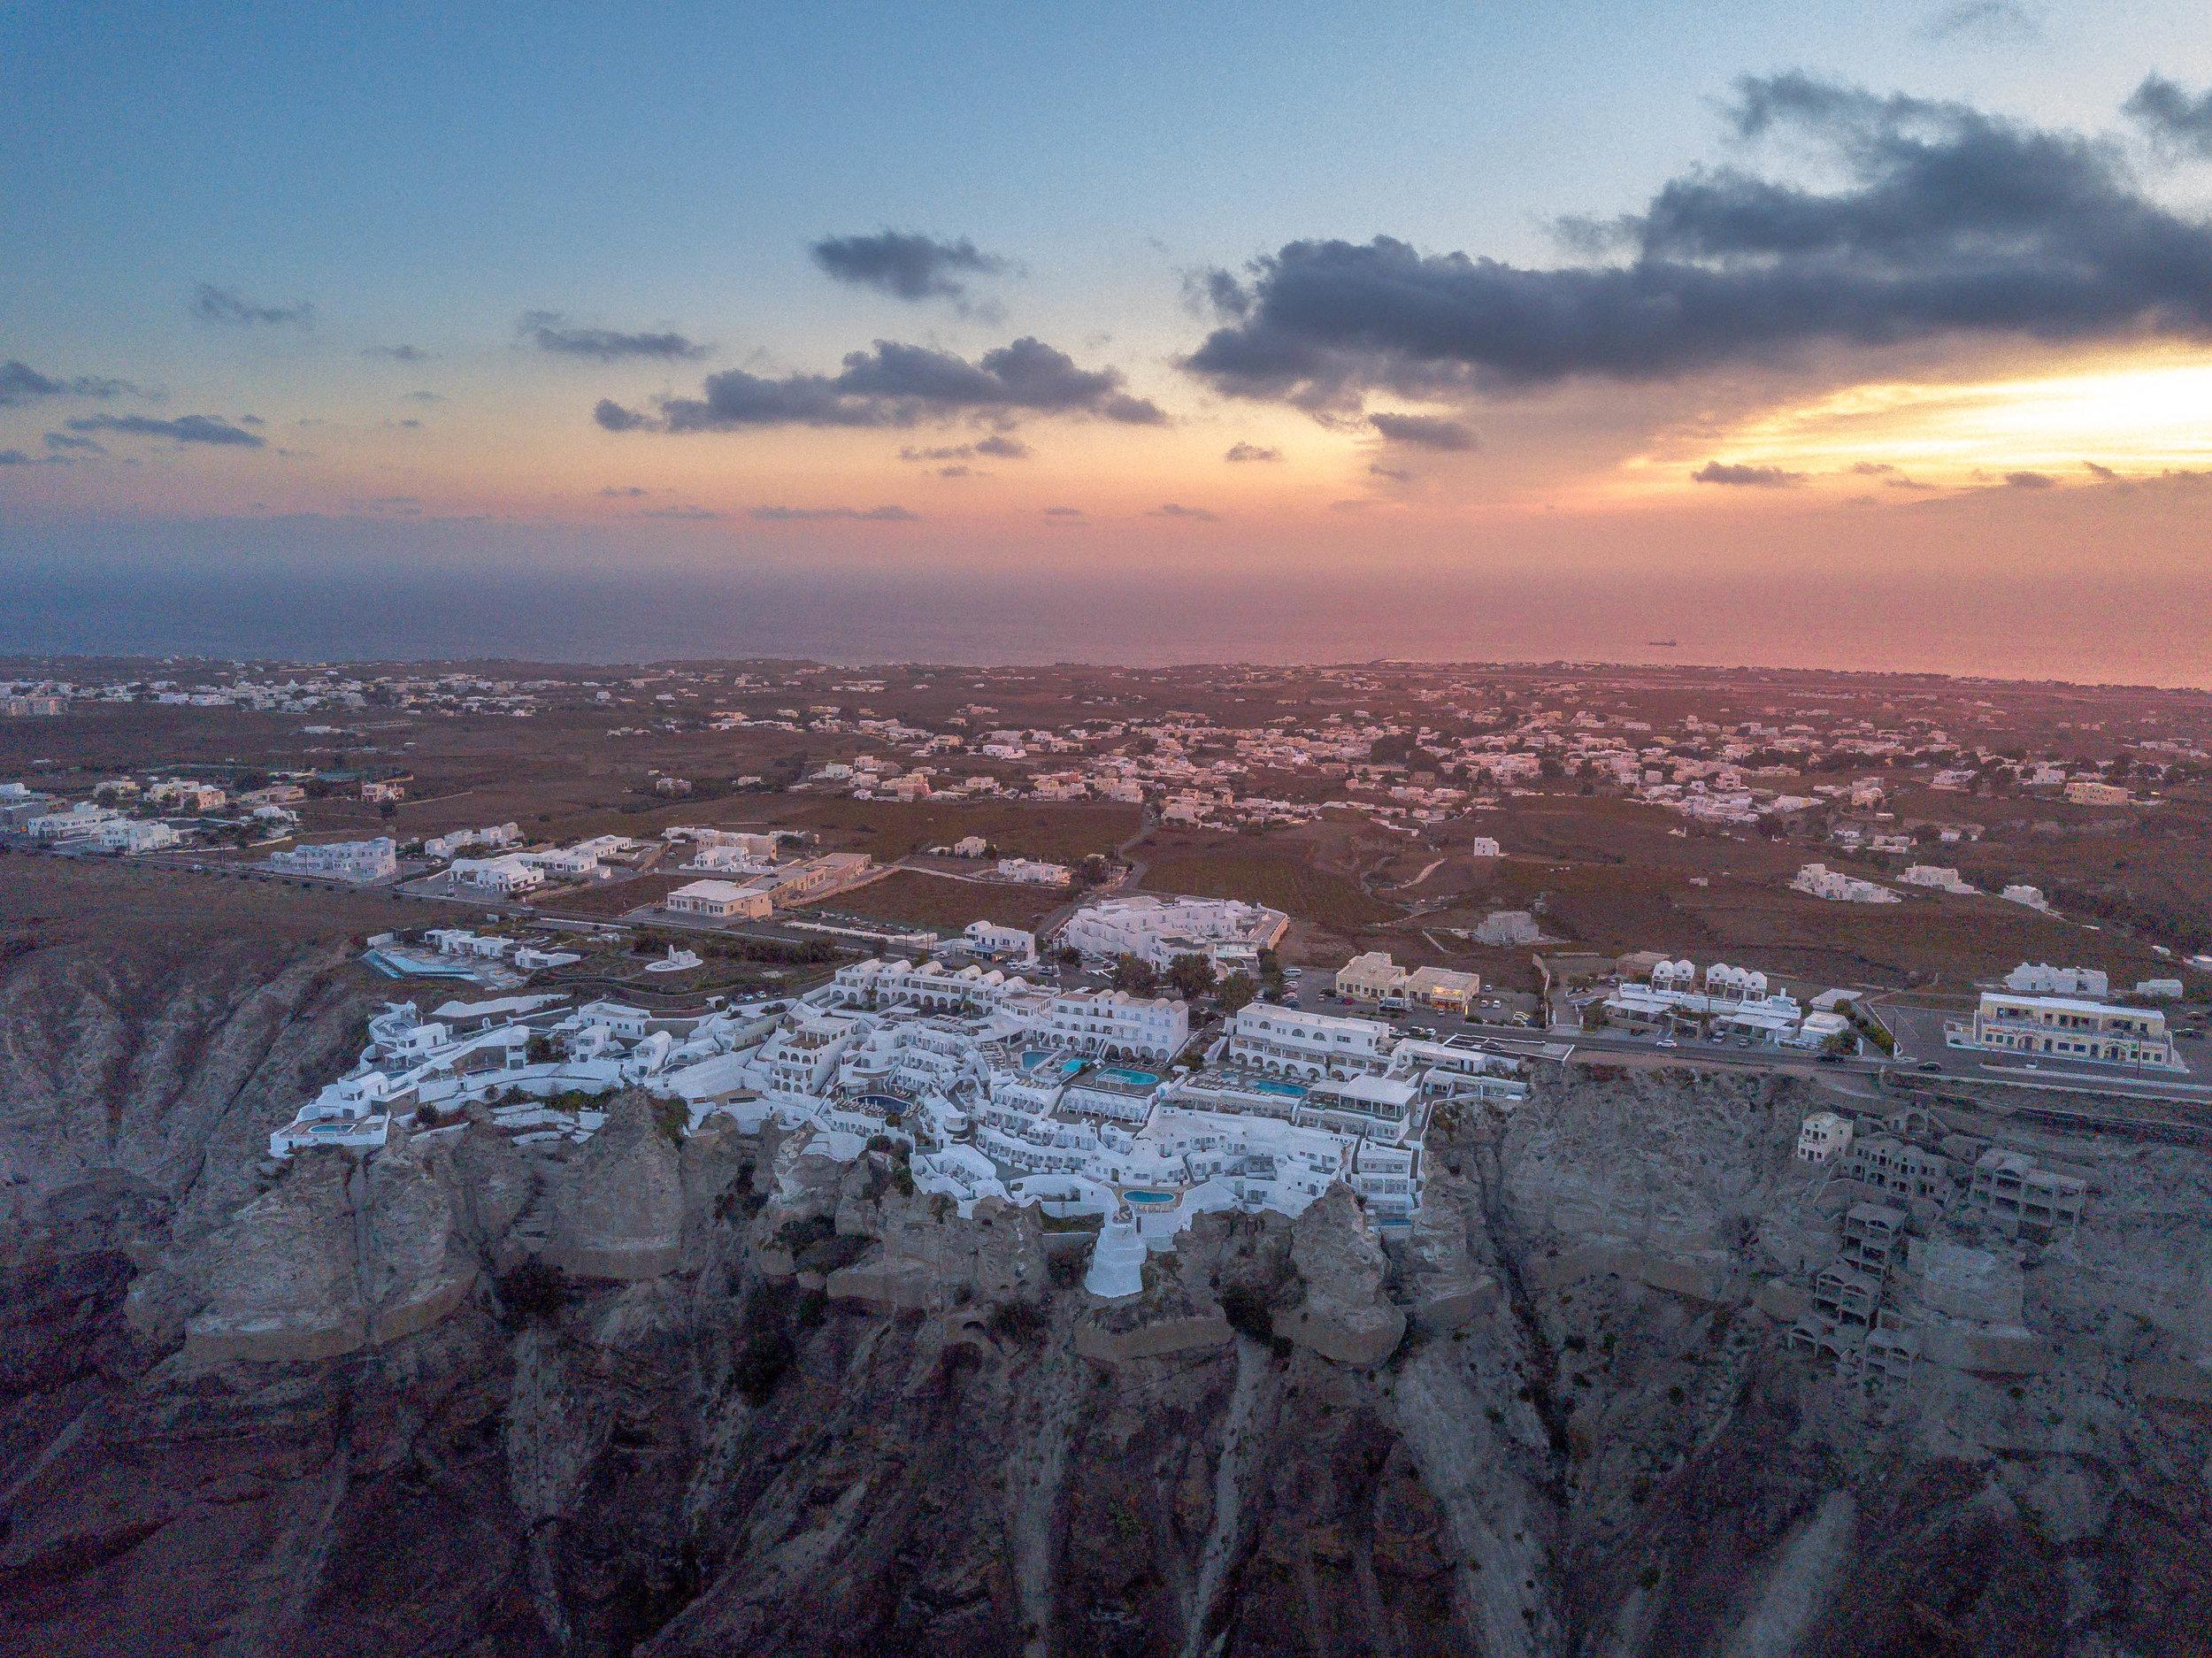 Santorini by drone